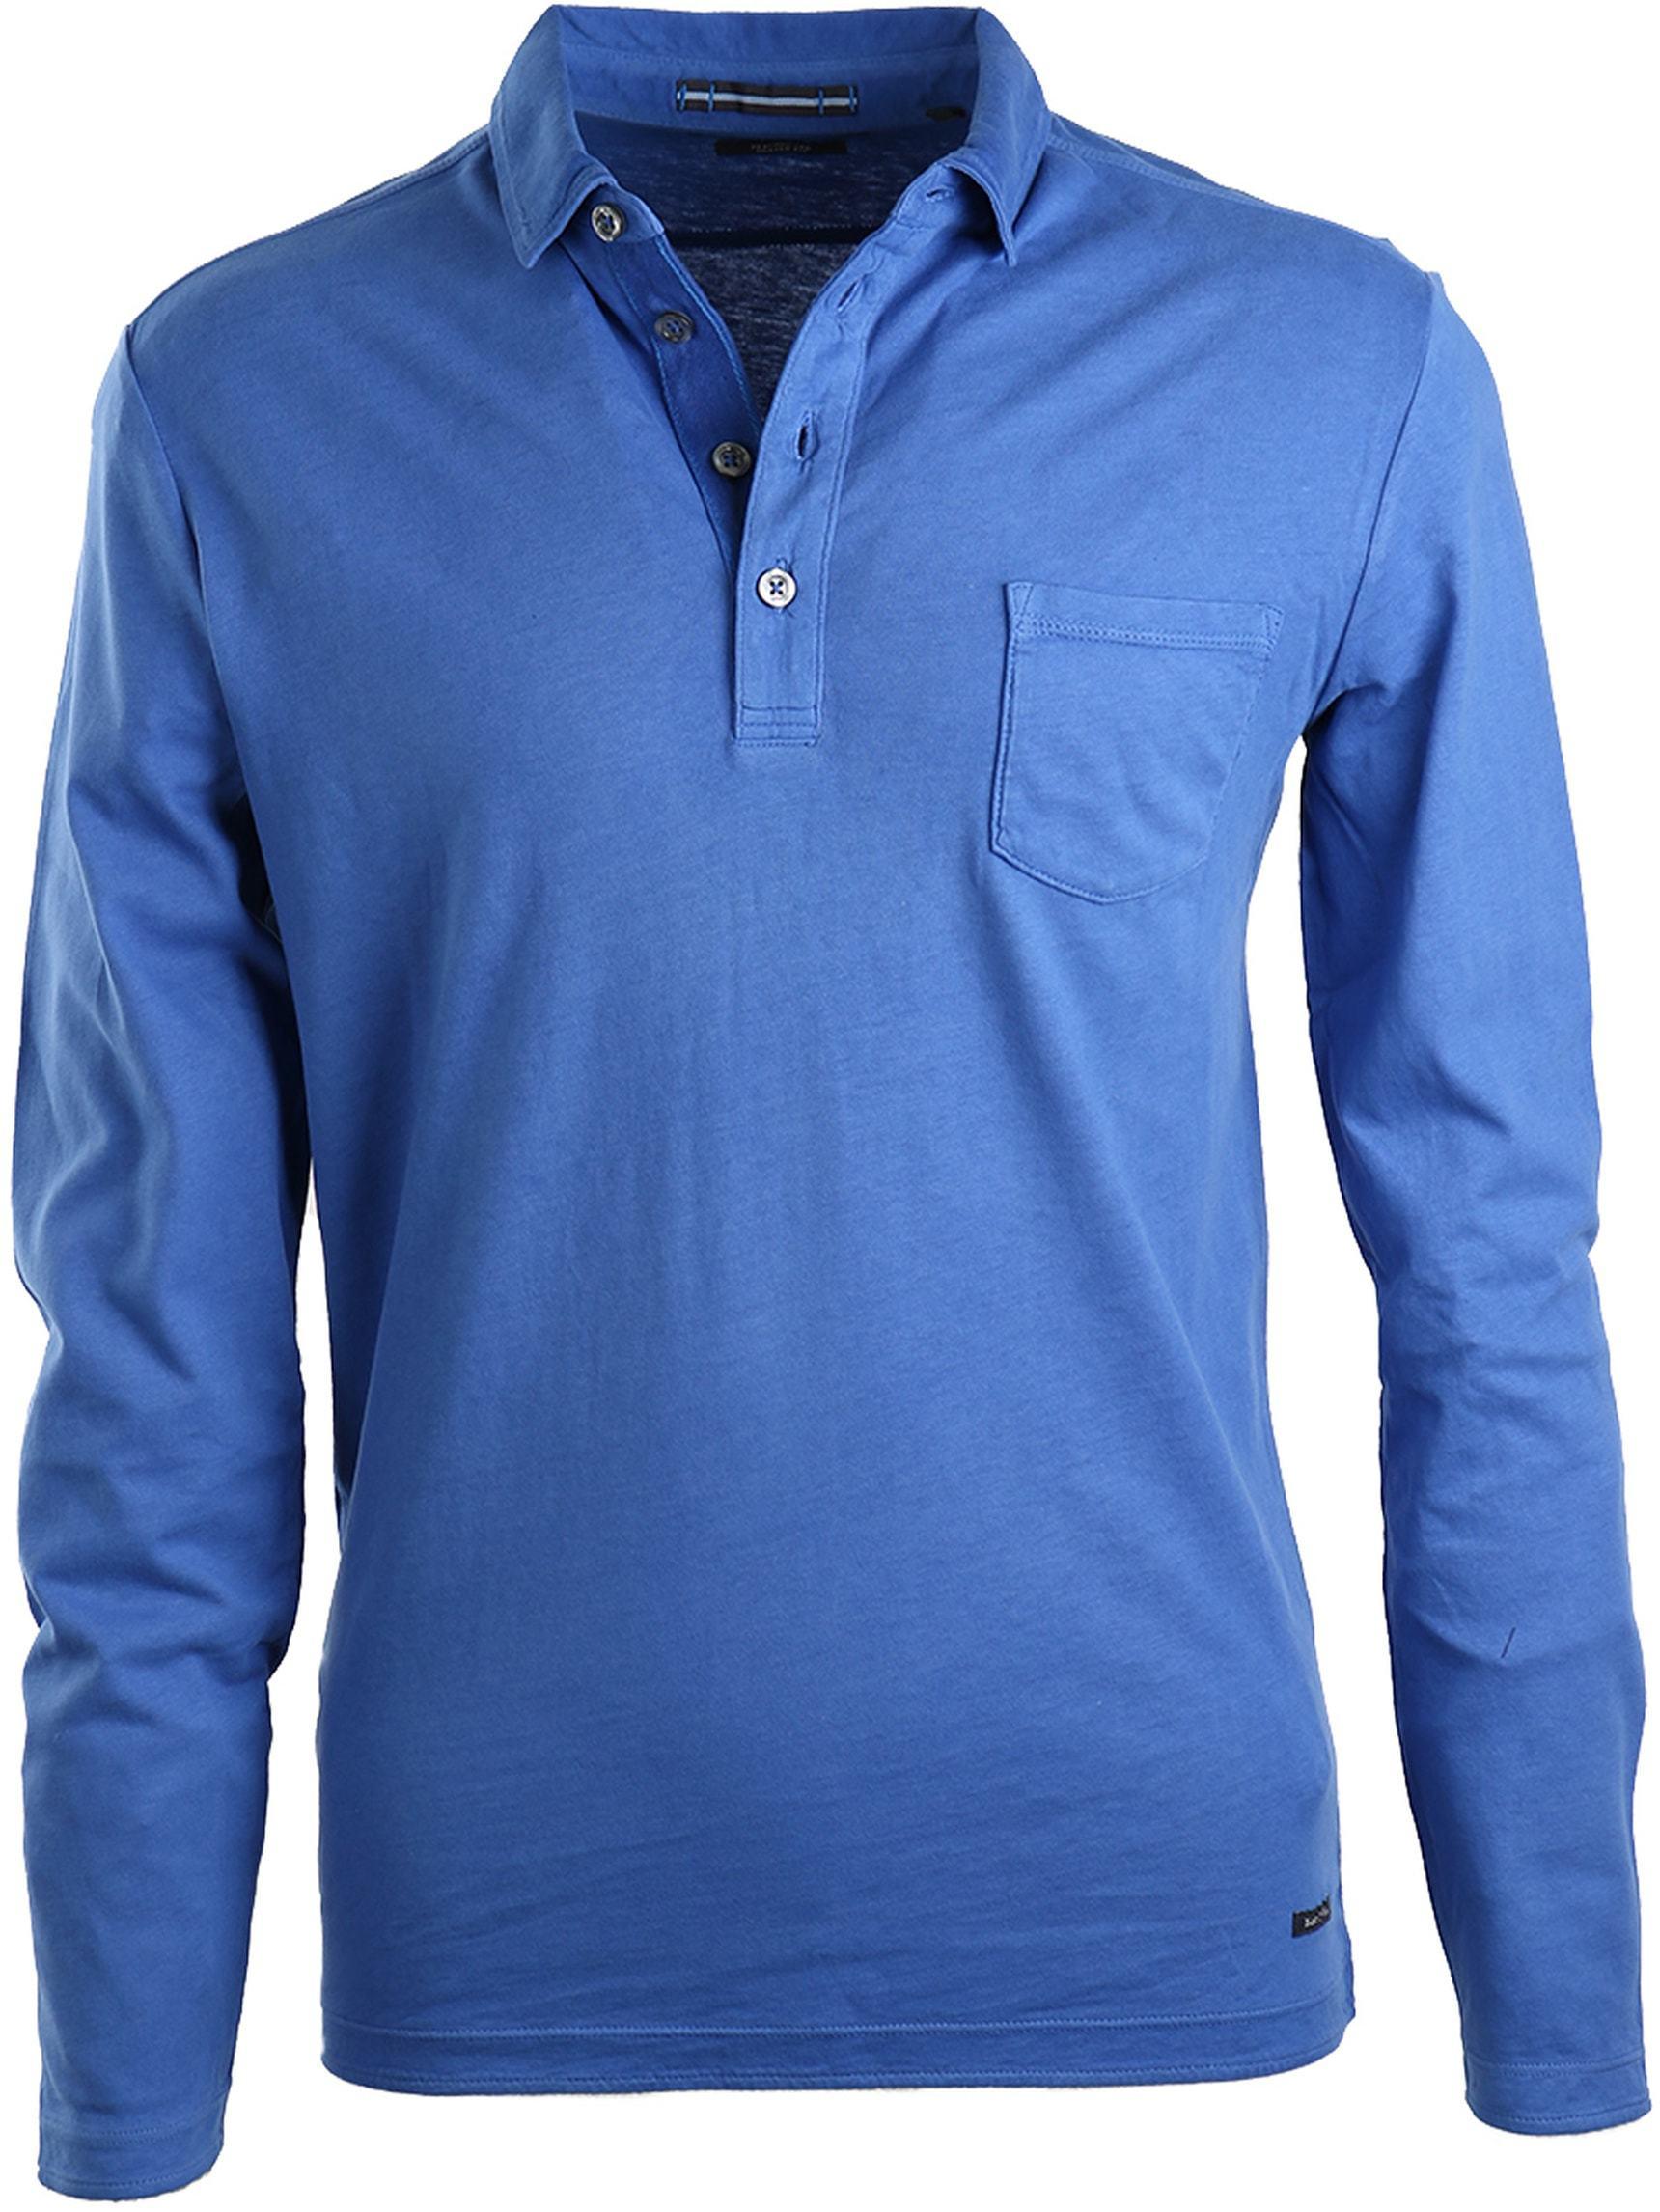 42153161c5 Marc O'Polo Polo Longsleeve Blue 728227955010 order online | Suitable